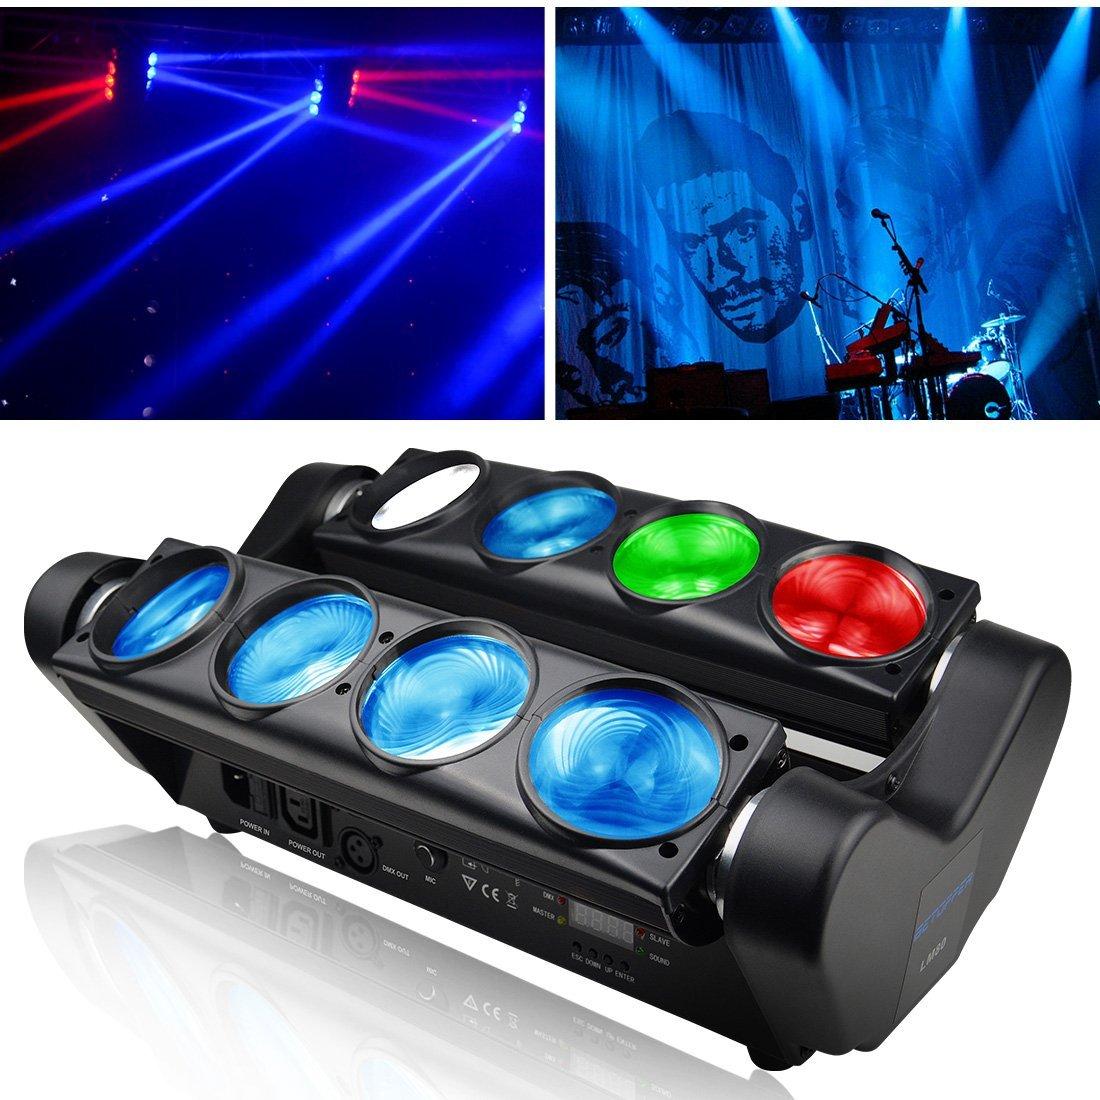 BETOPPER Spider Moving Head Light RGBW, 8 x 3W LED Lighting DMX 512 Dual Sweeper Pulse Strobe Effect for DJ Live Concert Lighting 4334419323